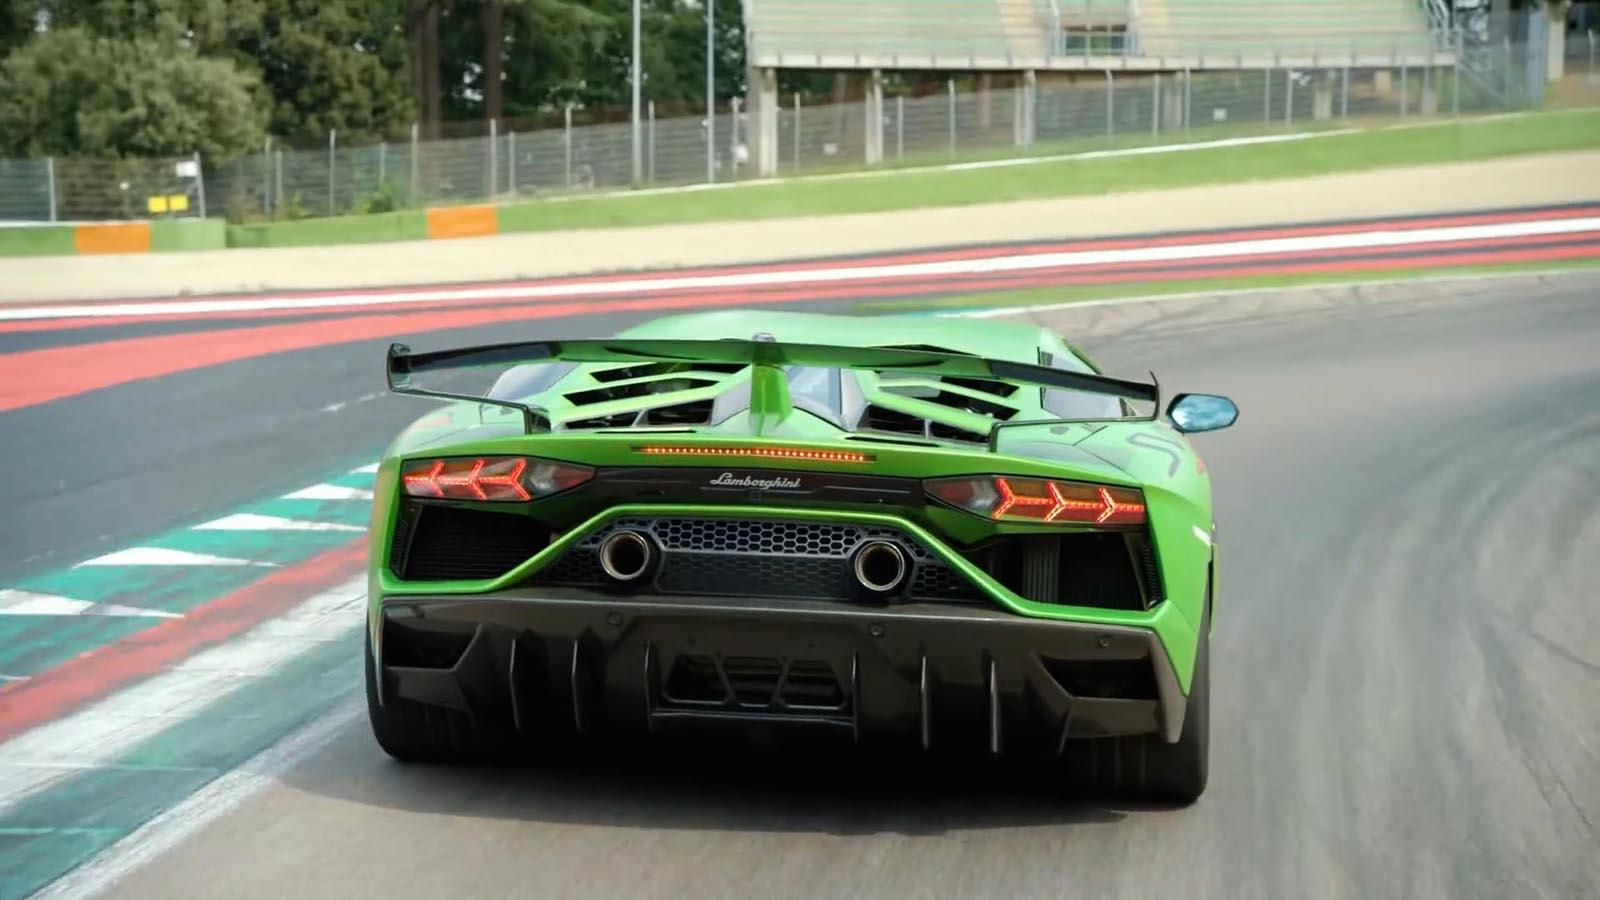 Photo of Μάθετε τα μυστικά της αεροδυναμικής της Lamborghini Aventador SVJ [vid]